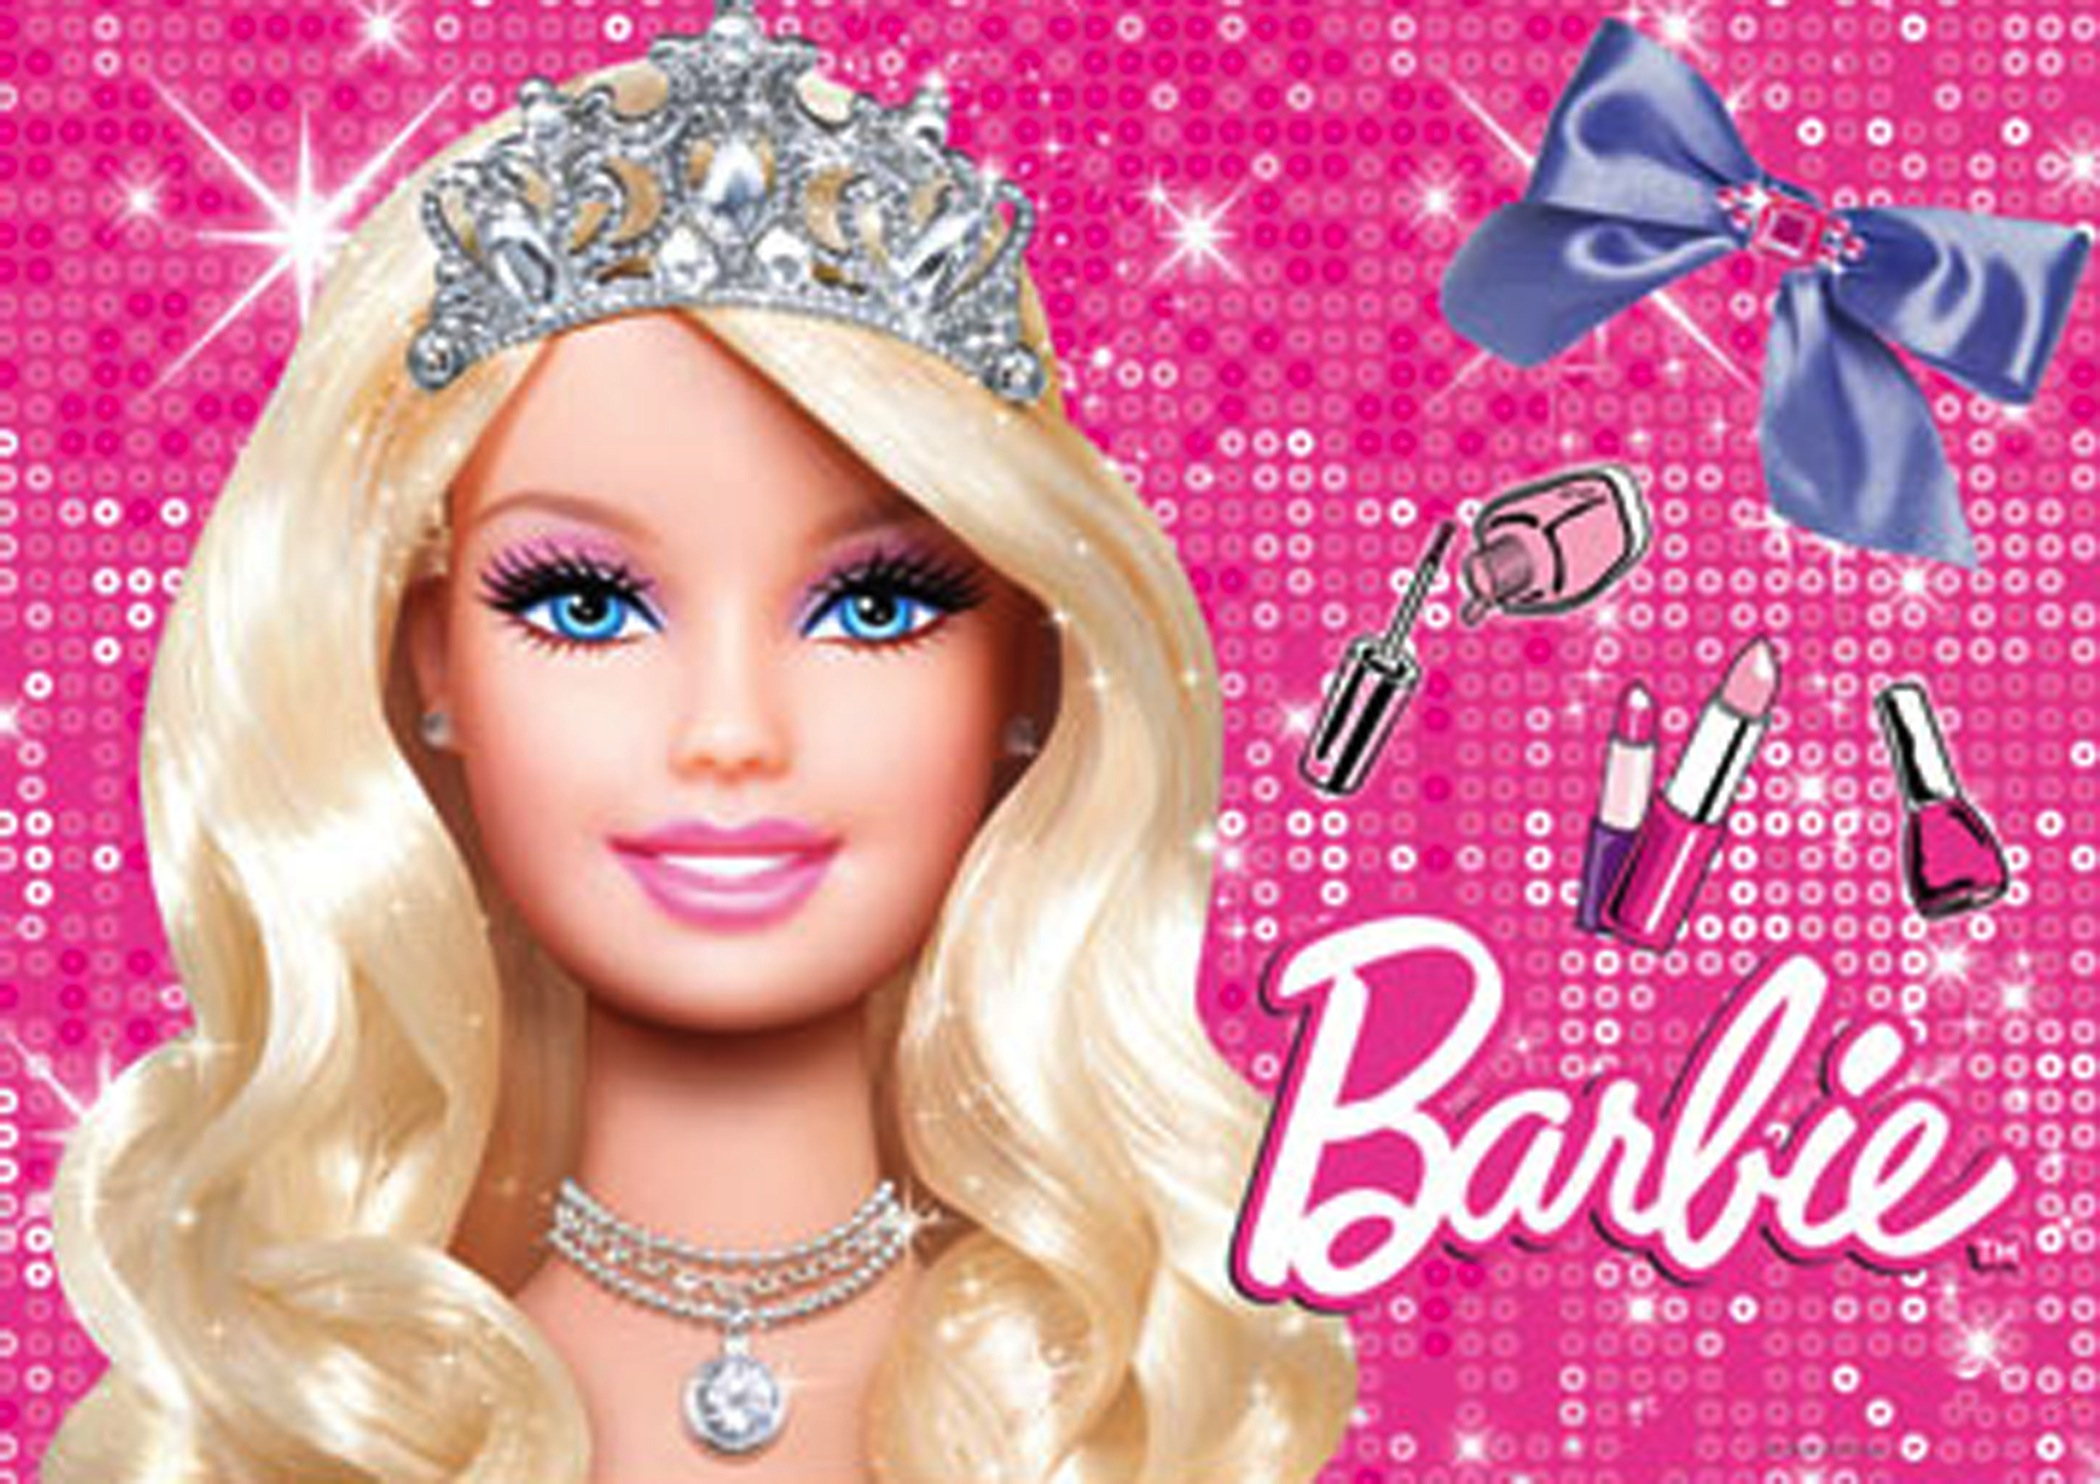 Nice wallpapers Barbie 2100x1484px